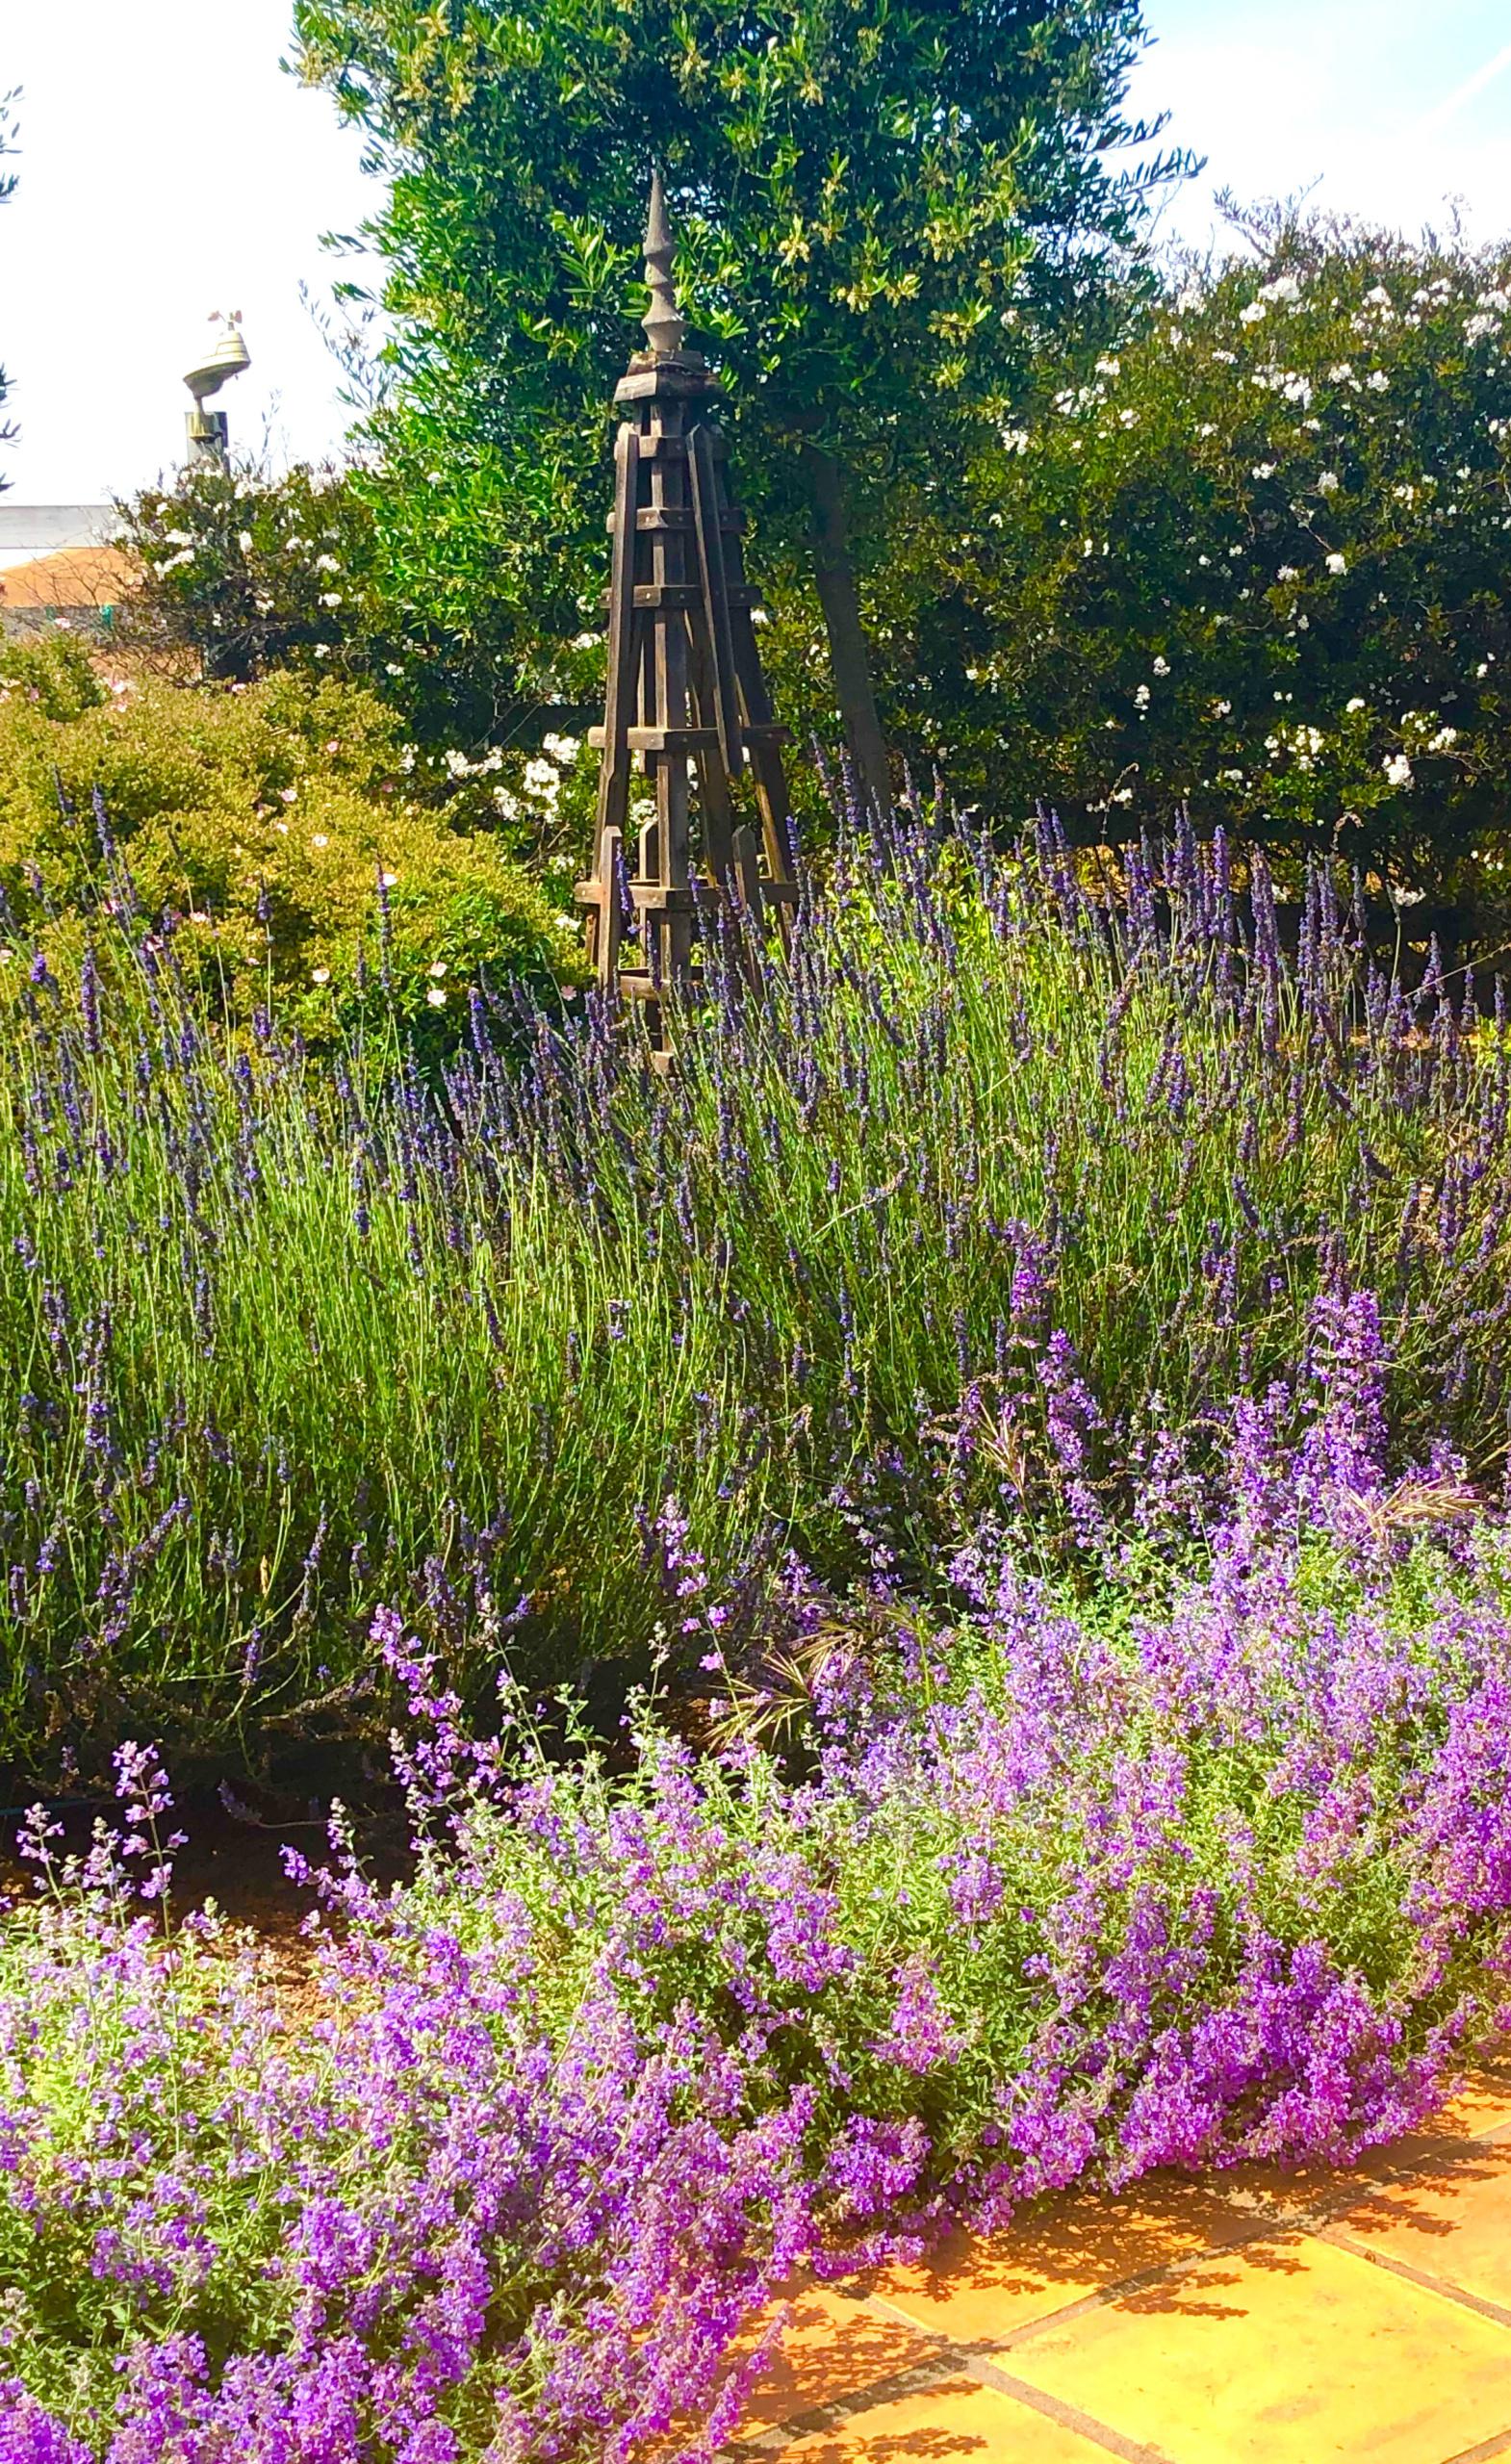 garden spire in design blogger cindy hattersley's beautiful garden